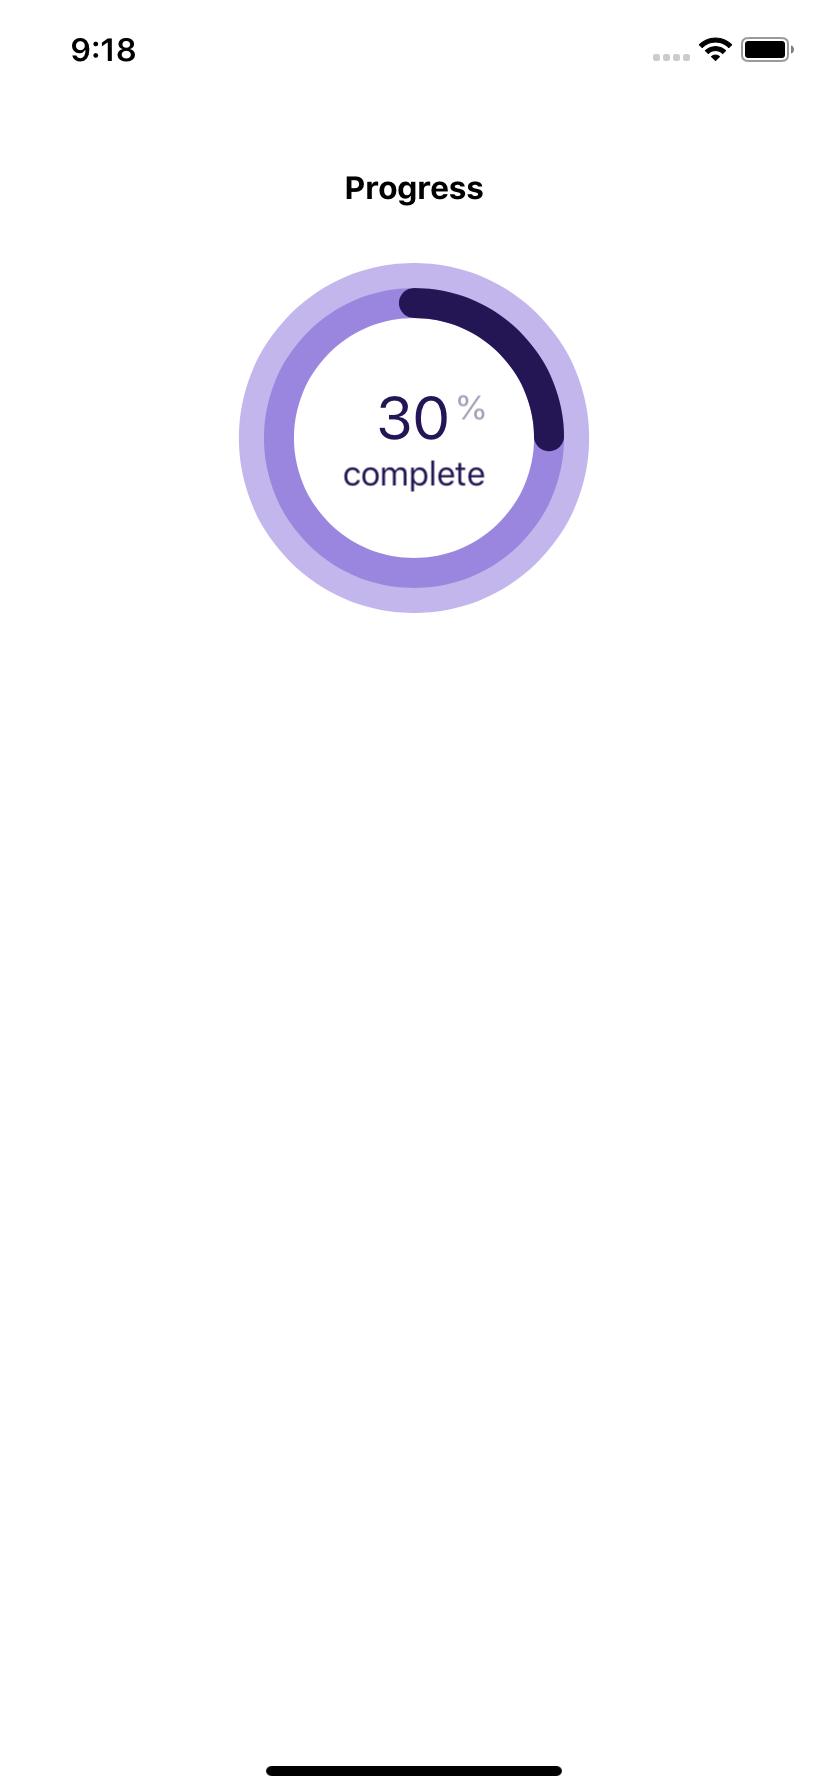 Circular progress bar with percentage